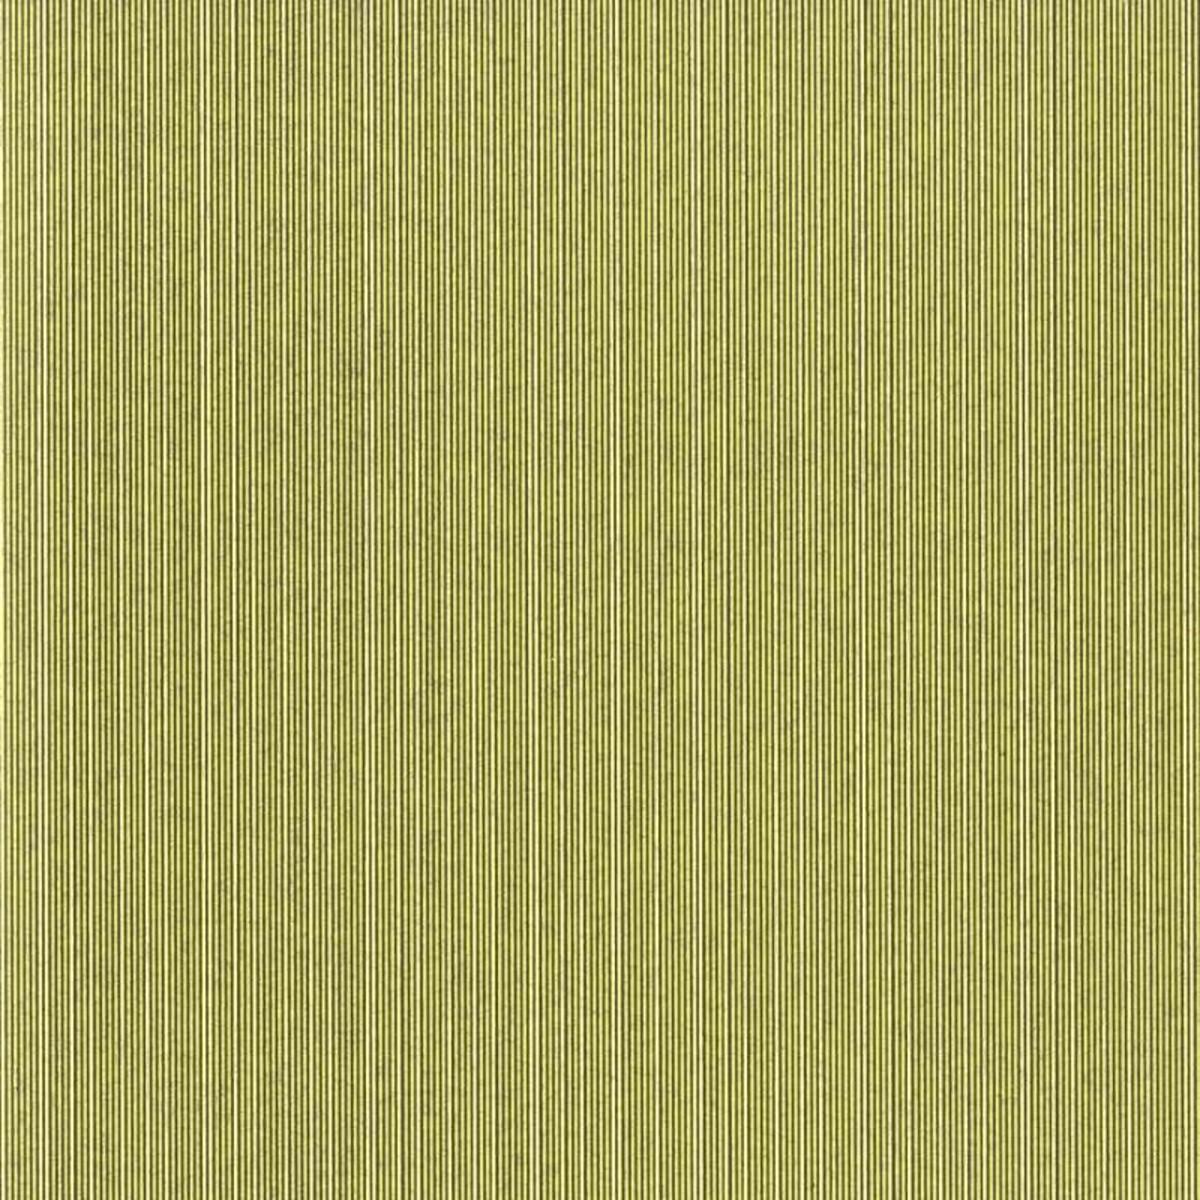 Виниловые обои York Wallcoverings зеленые FN3746 0.68 м